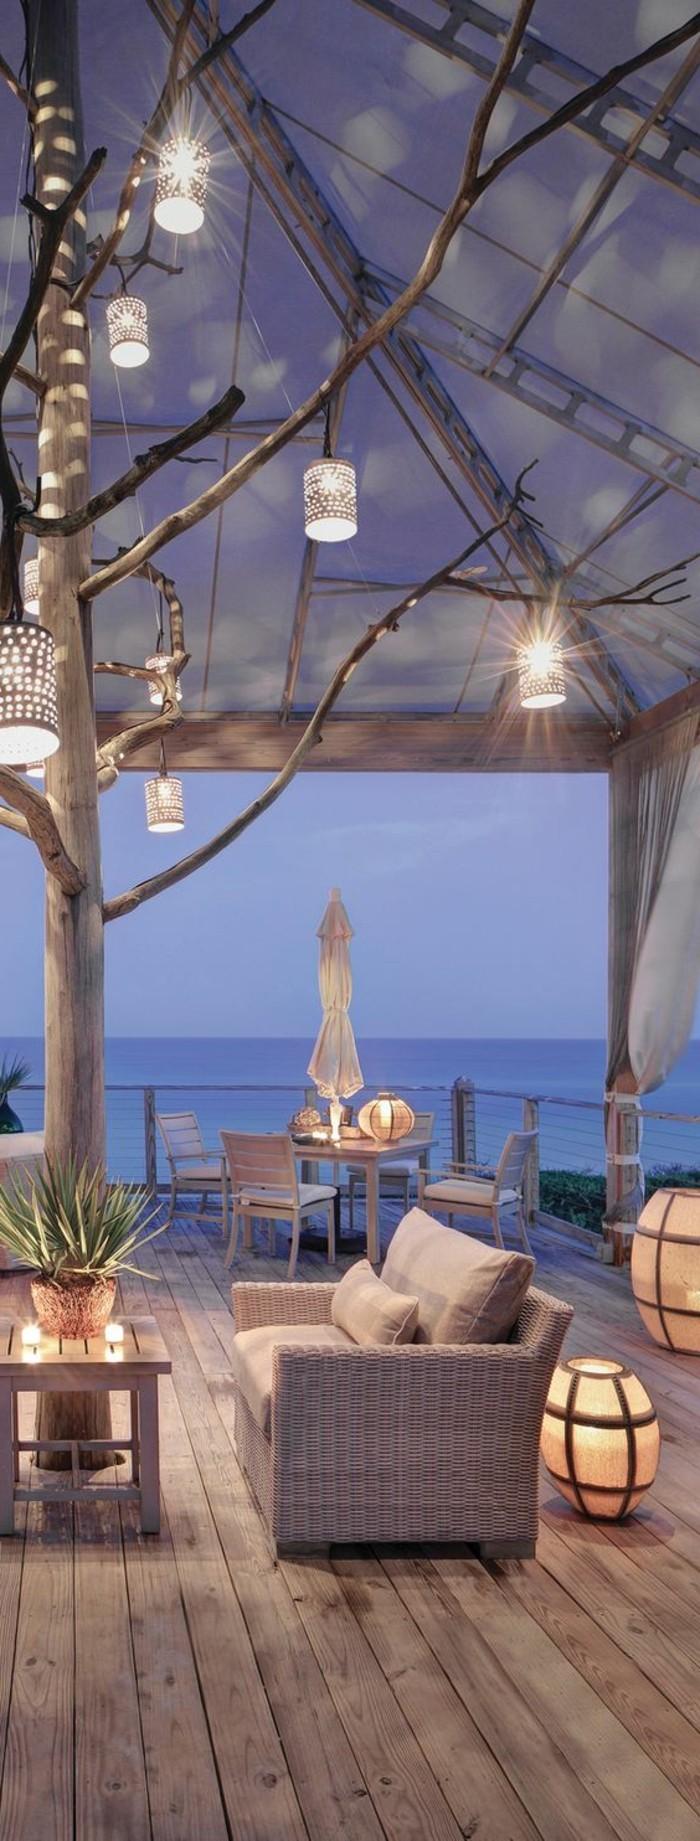 balkongestaltung-bden-aus-holz-lampen-aus-konservendosen-sessel-meer-tisch-stühle